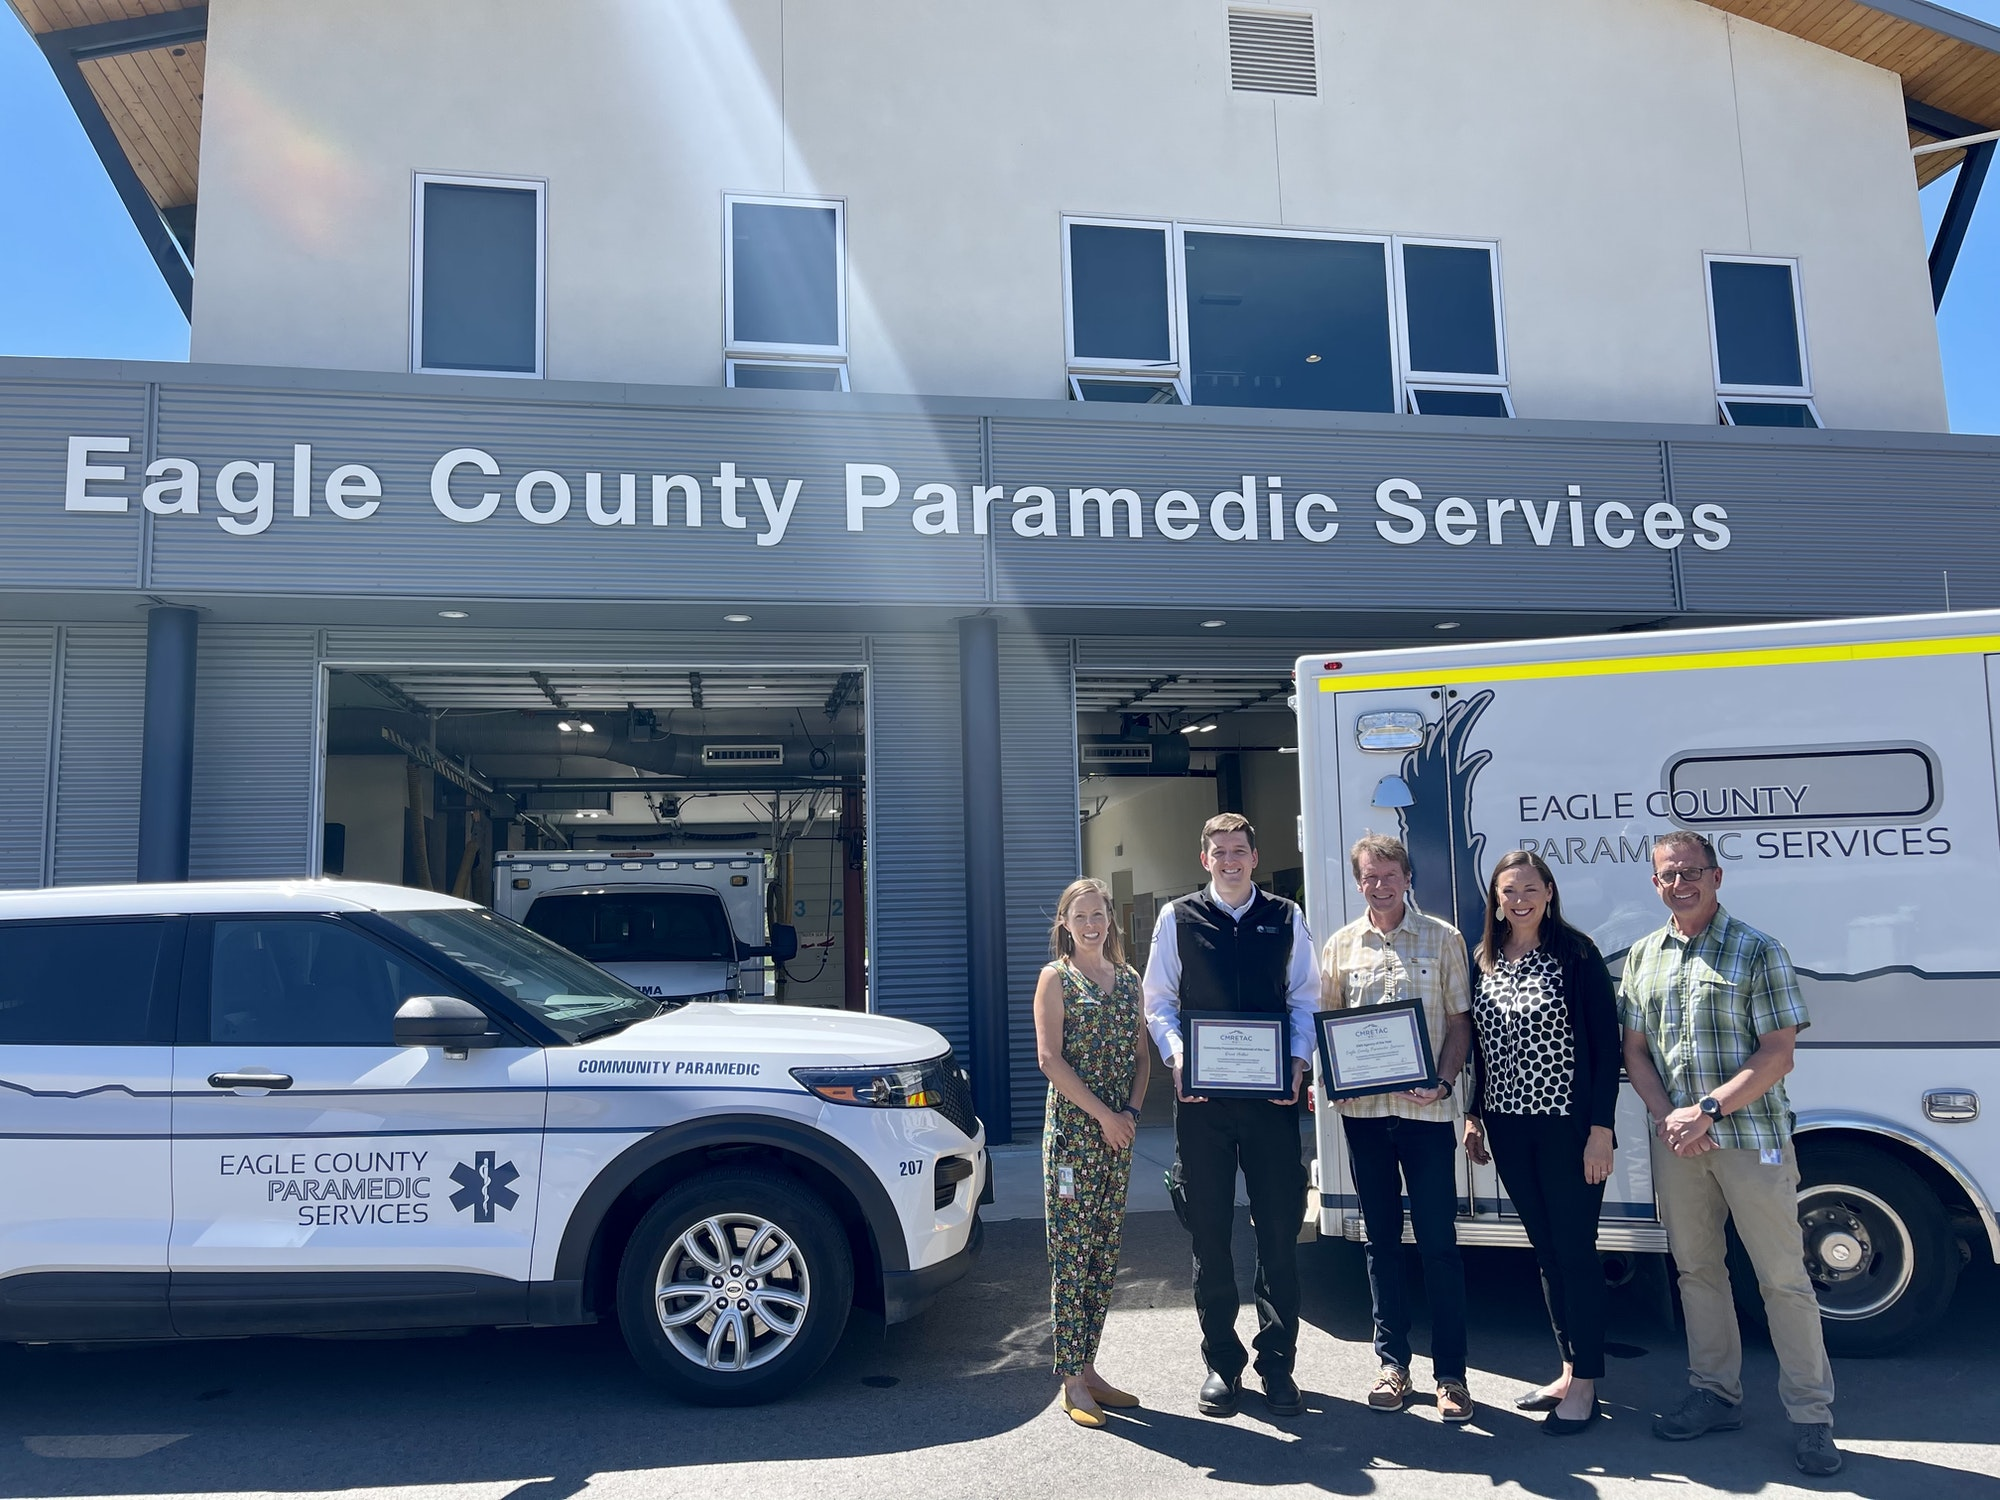 Amy Gnojek, David Miller, Jim Bradford, Sarah Weatherred, Steve Vardaman in front of a CP vehicle and amublance